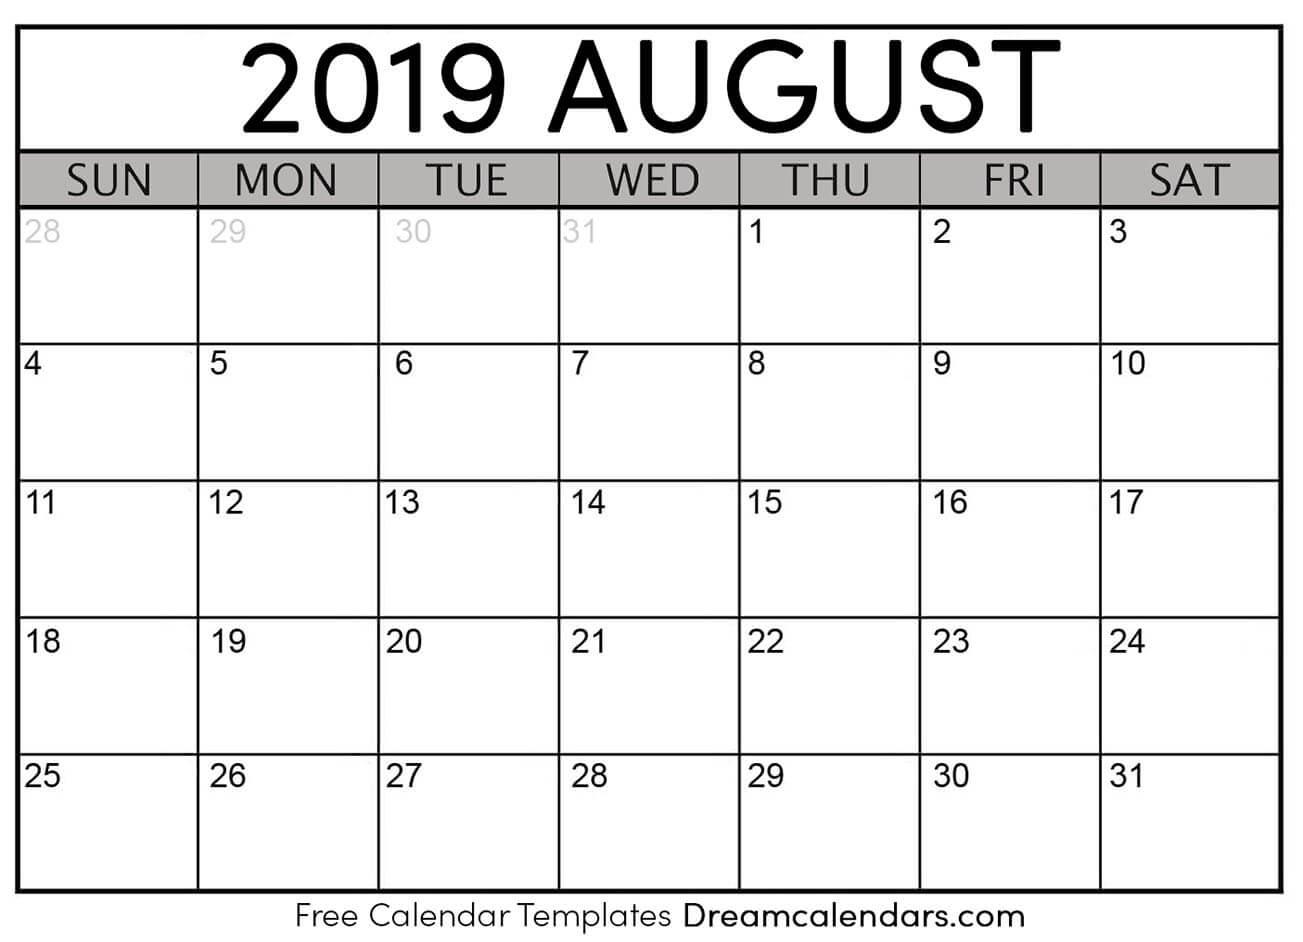 Printable August 2019 Calendar regarding August Calendar Template Printable